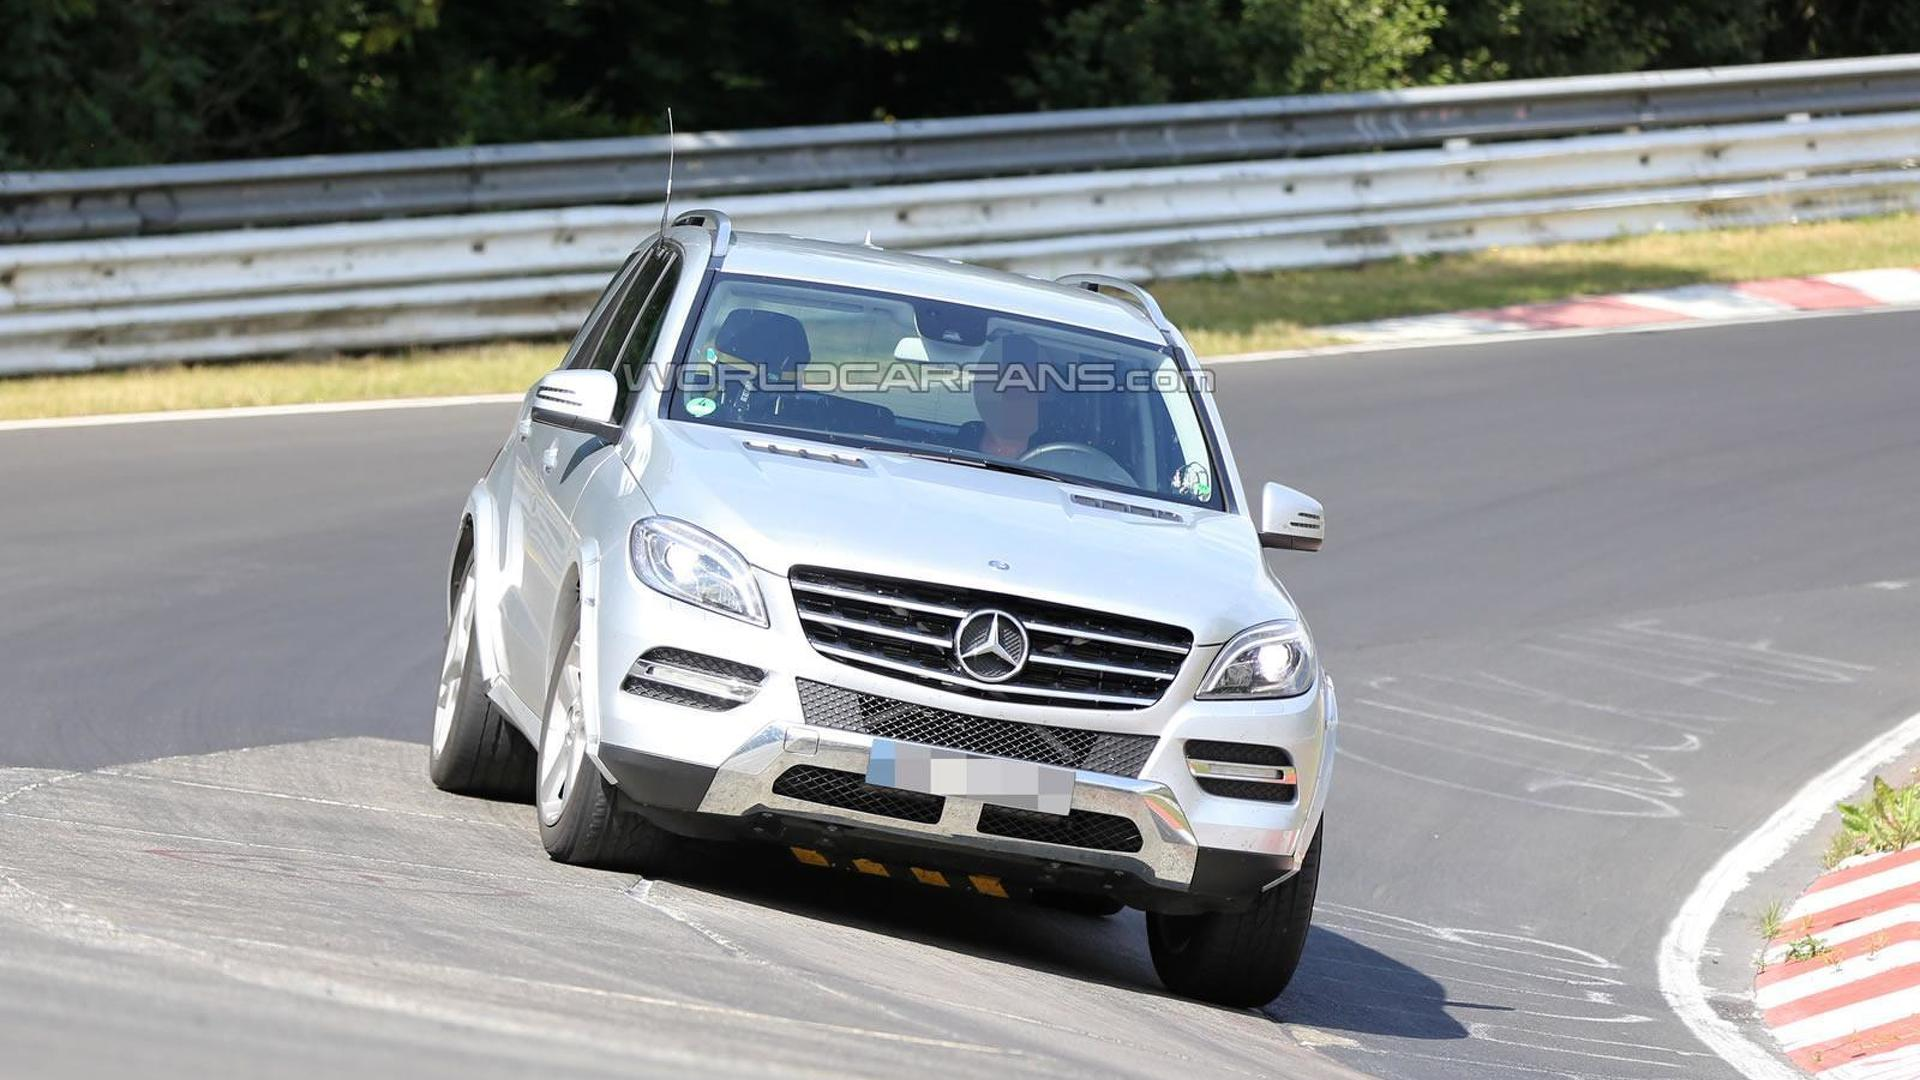 2015 Mercedes Benz Mlc Spied Undergoing Testing Motor1 Com